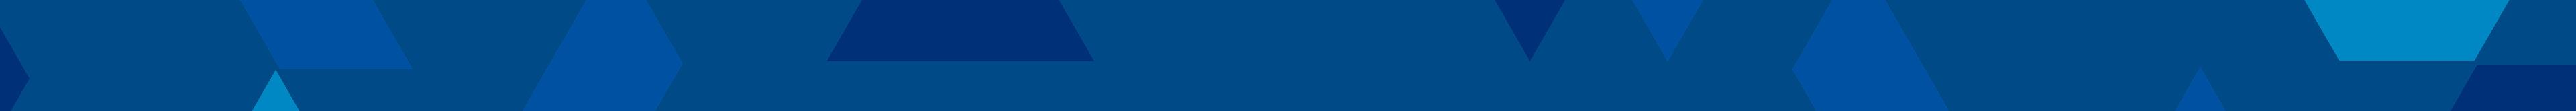 Nordic-Pattern-Banner-(10)